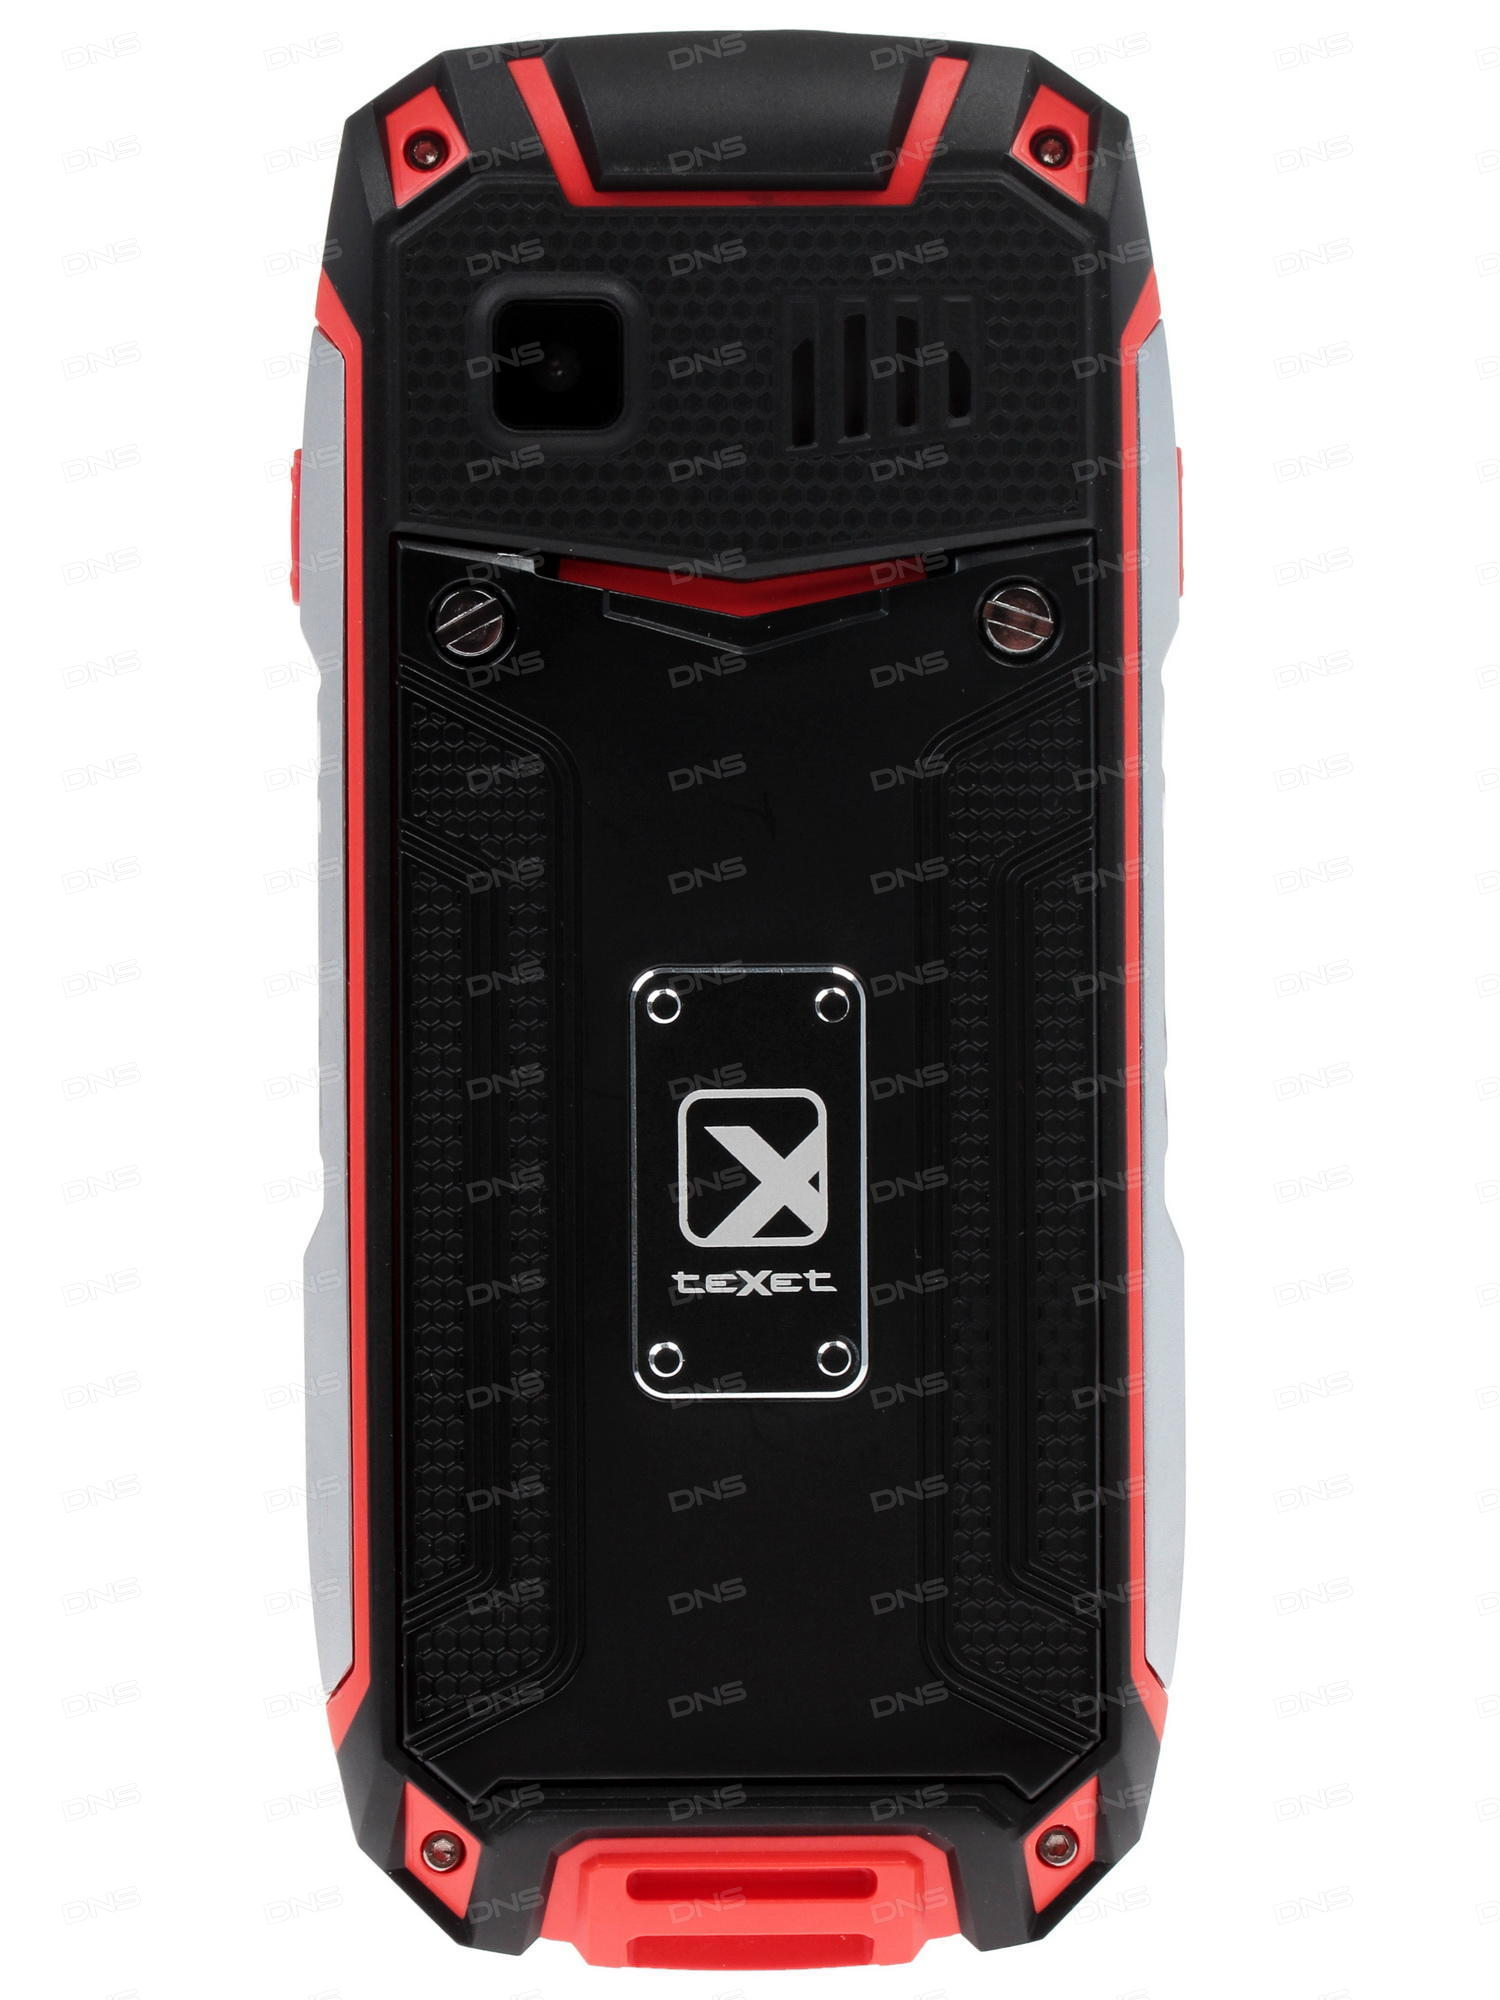 Сотовый телефон teXet TM-B320 Black